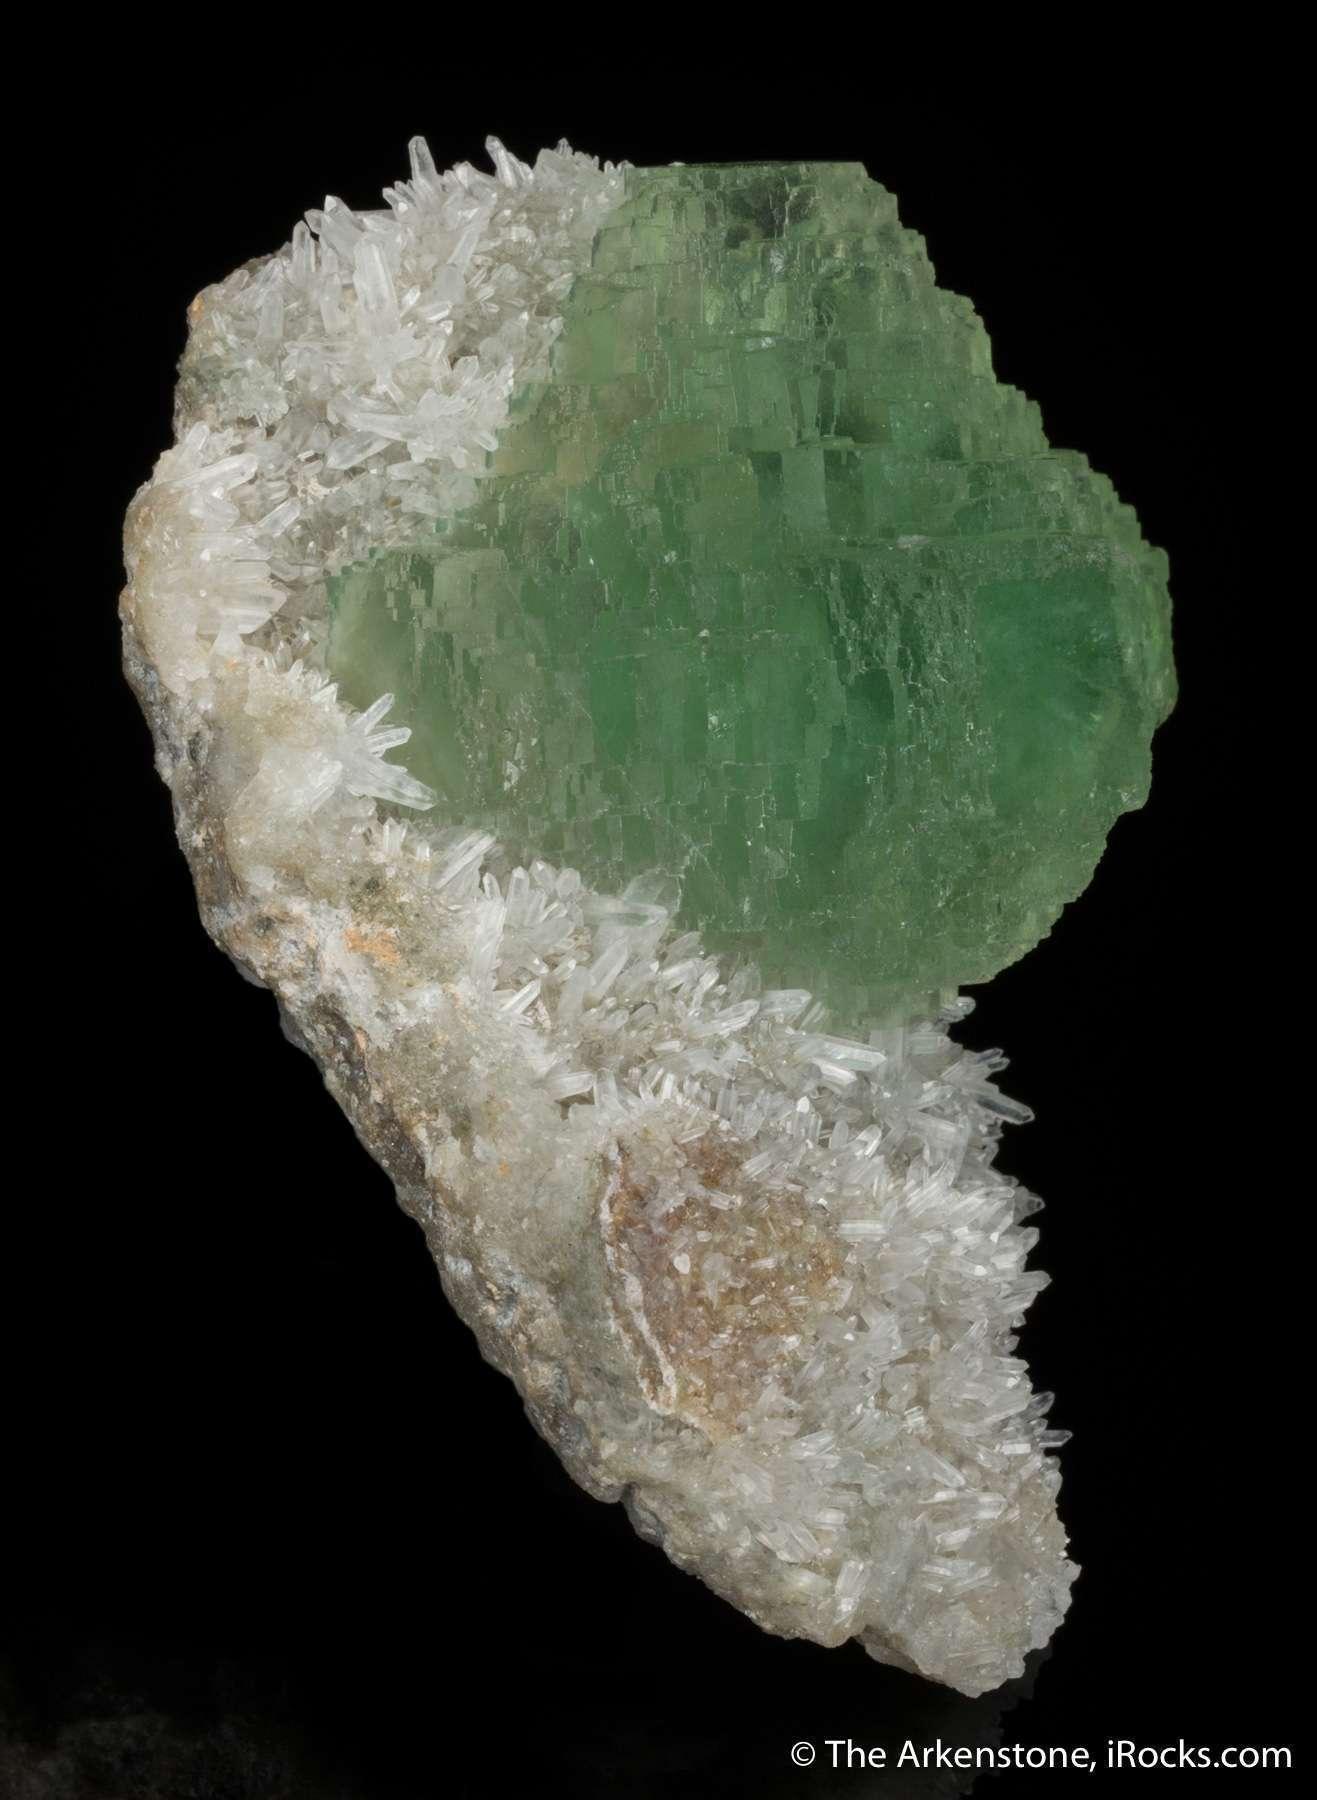 Perched aesthetically drusy sparkling pedestal quartz matrix single